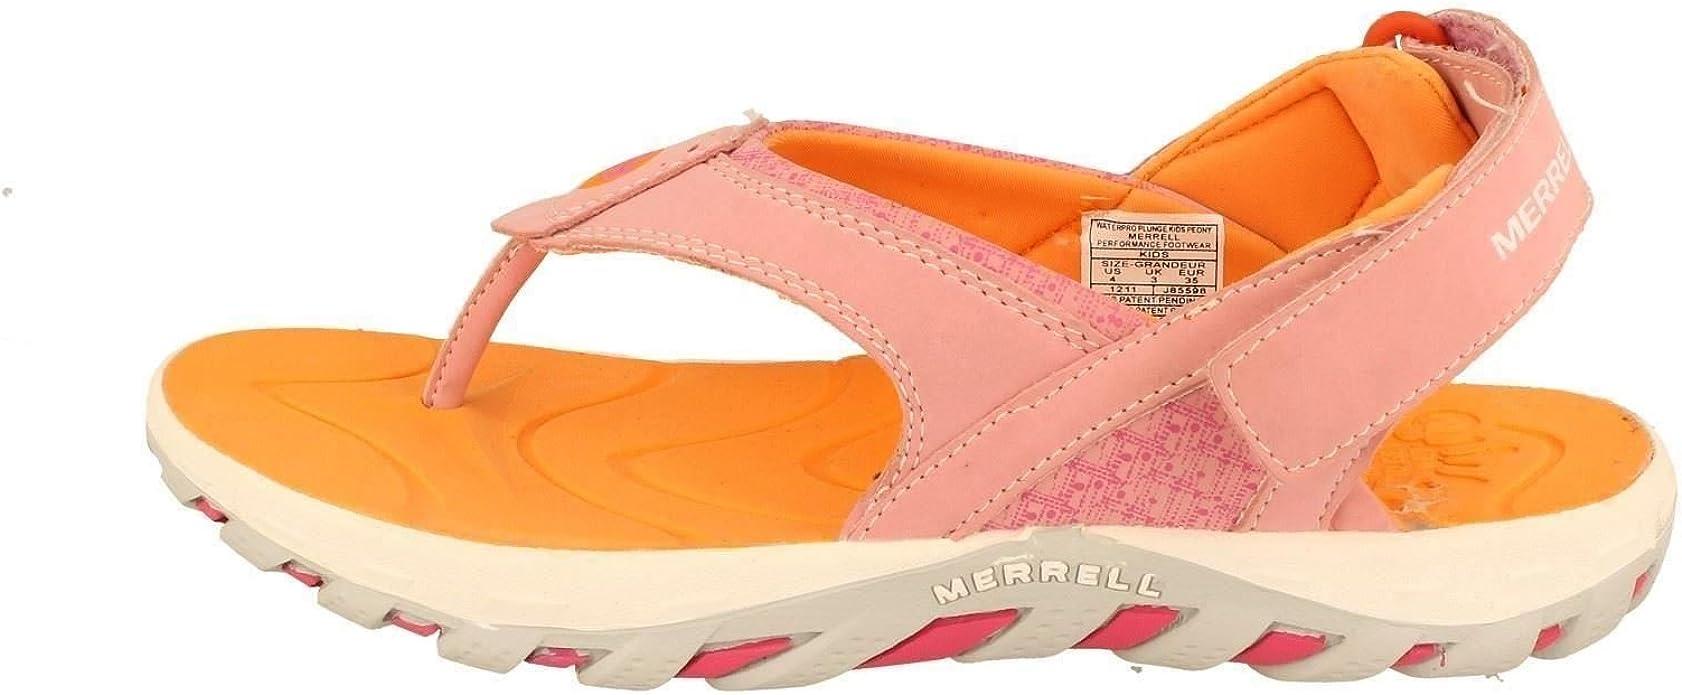 Filles Merrell Summer toe post sandals Eau Pro plongeant